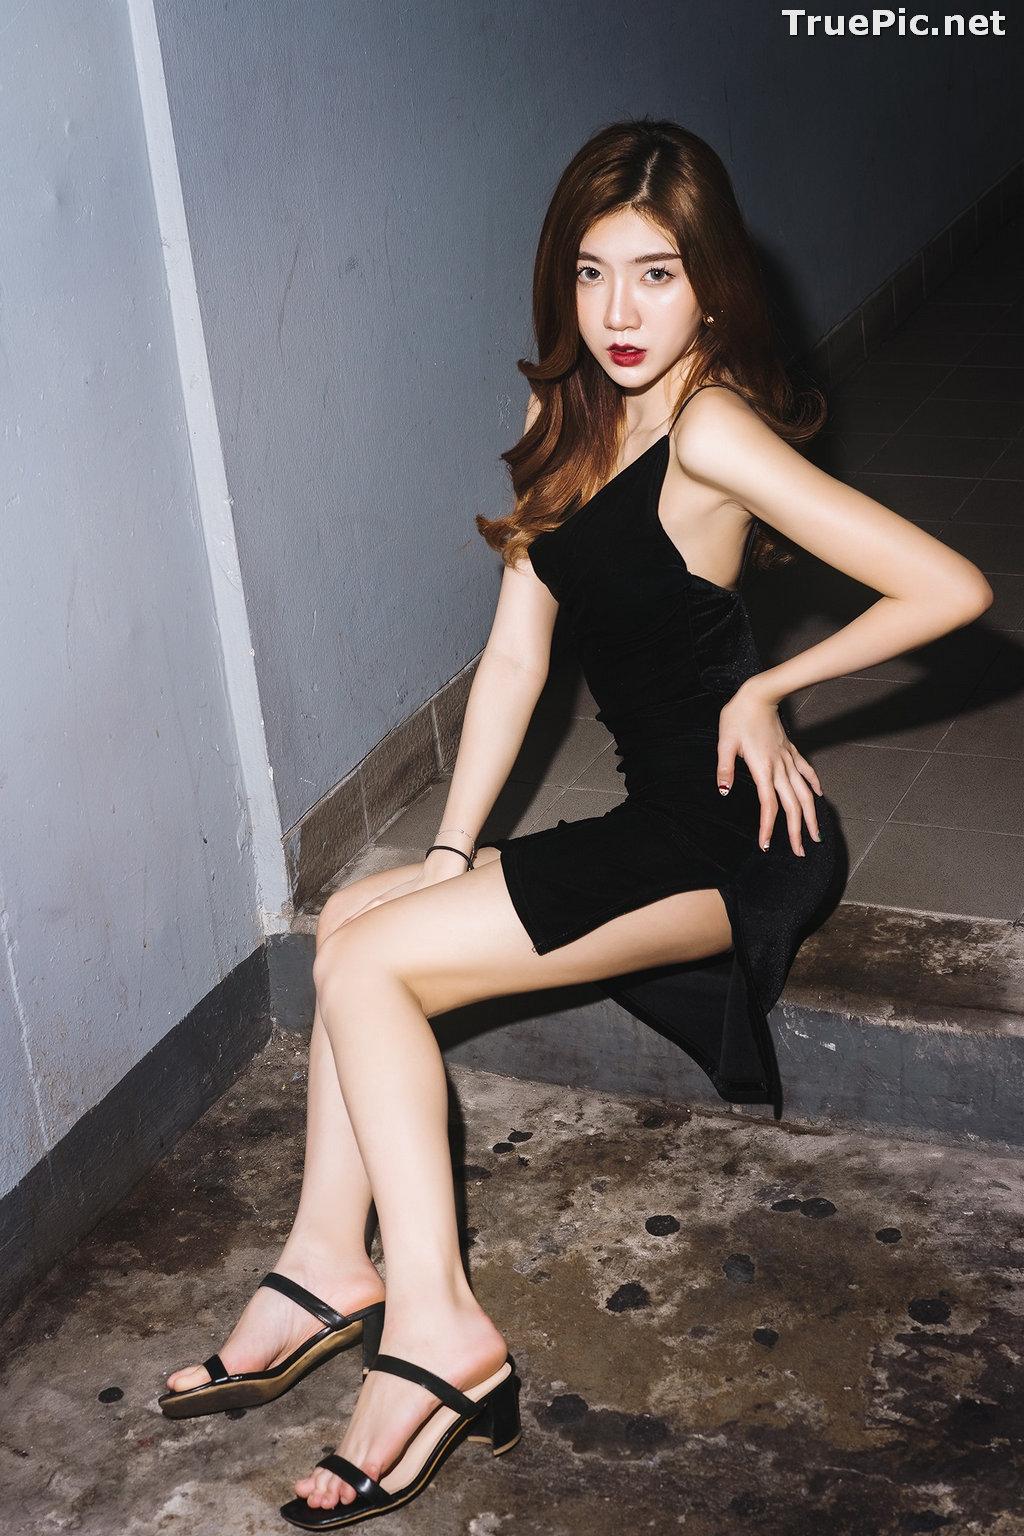 Image Thailand Model - Sasi Ngiunwan - Black For SiamNight - TruePic.net - Picture-27